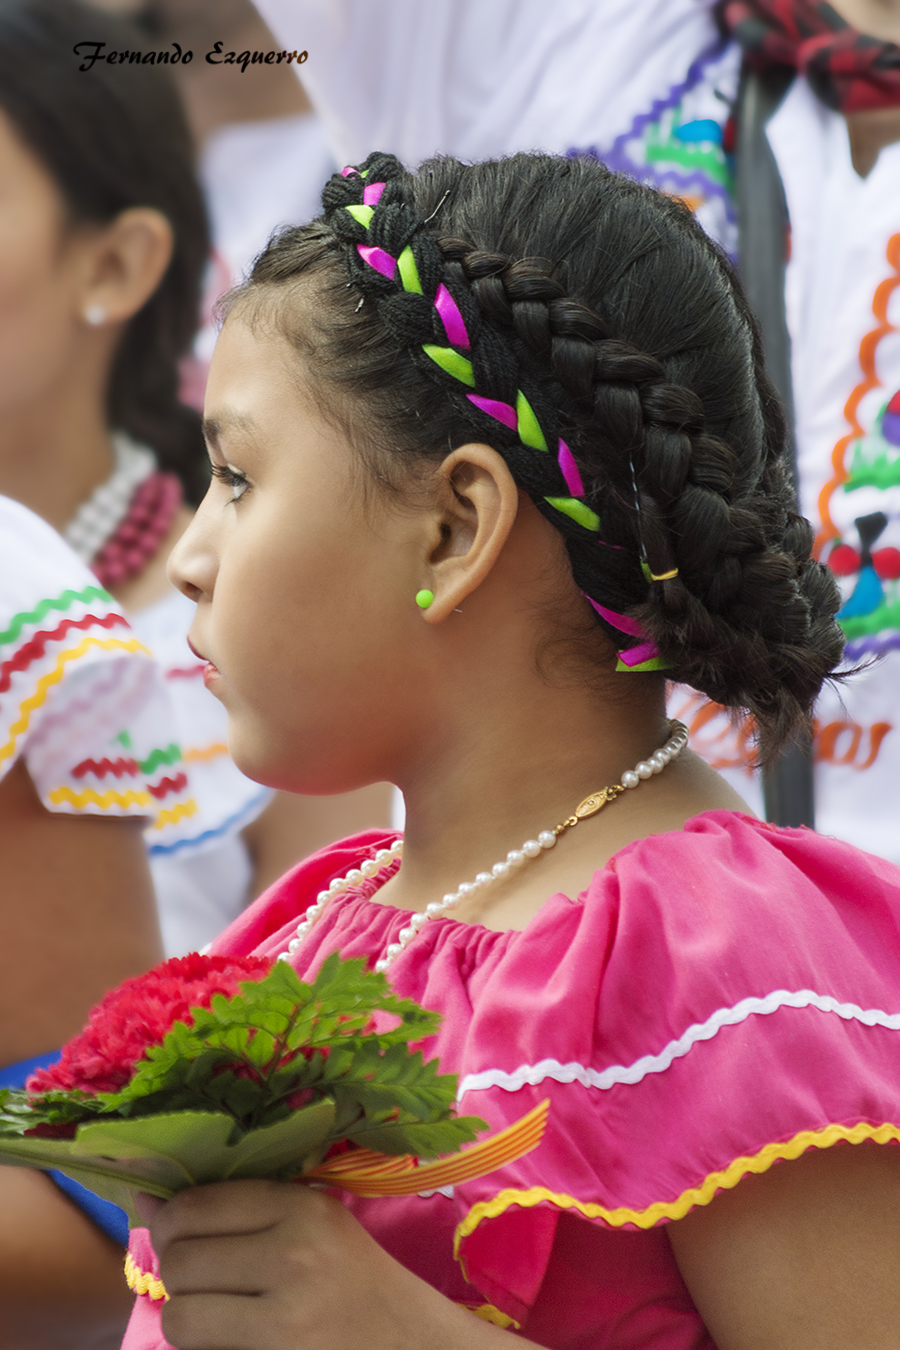 NICARAGUA en la Ofrenda de Flores a la Virgen del Pilar